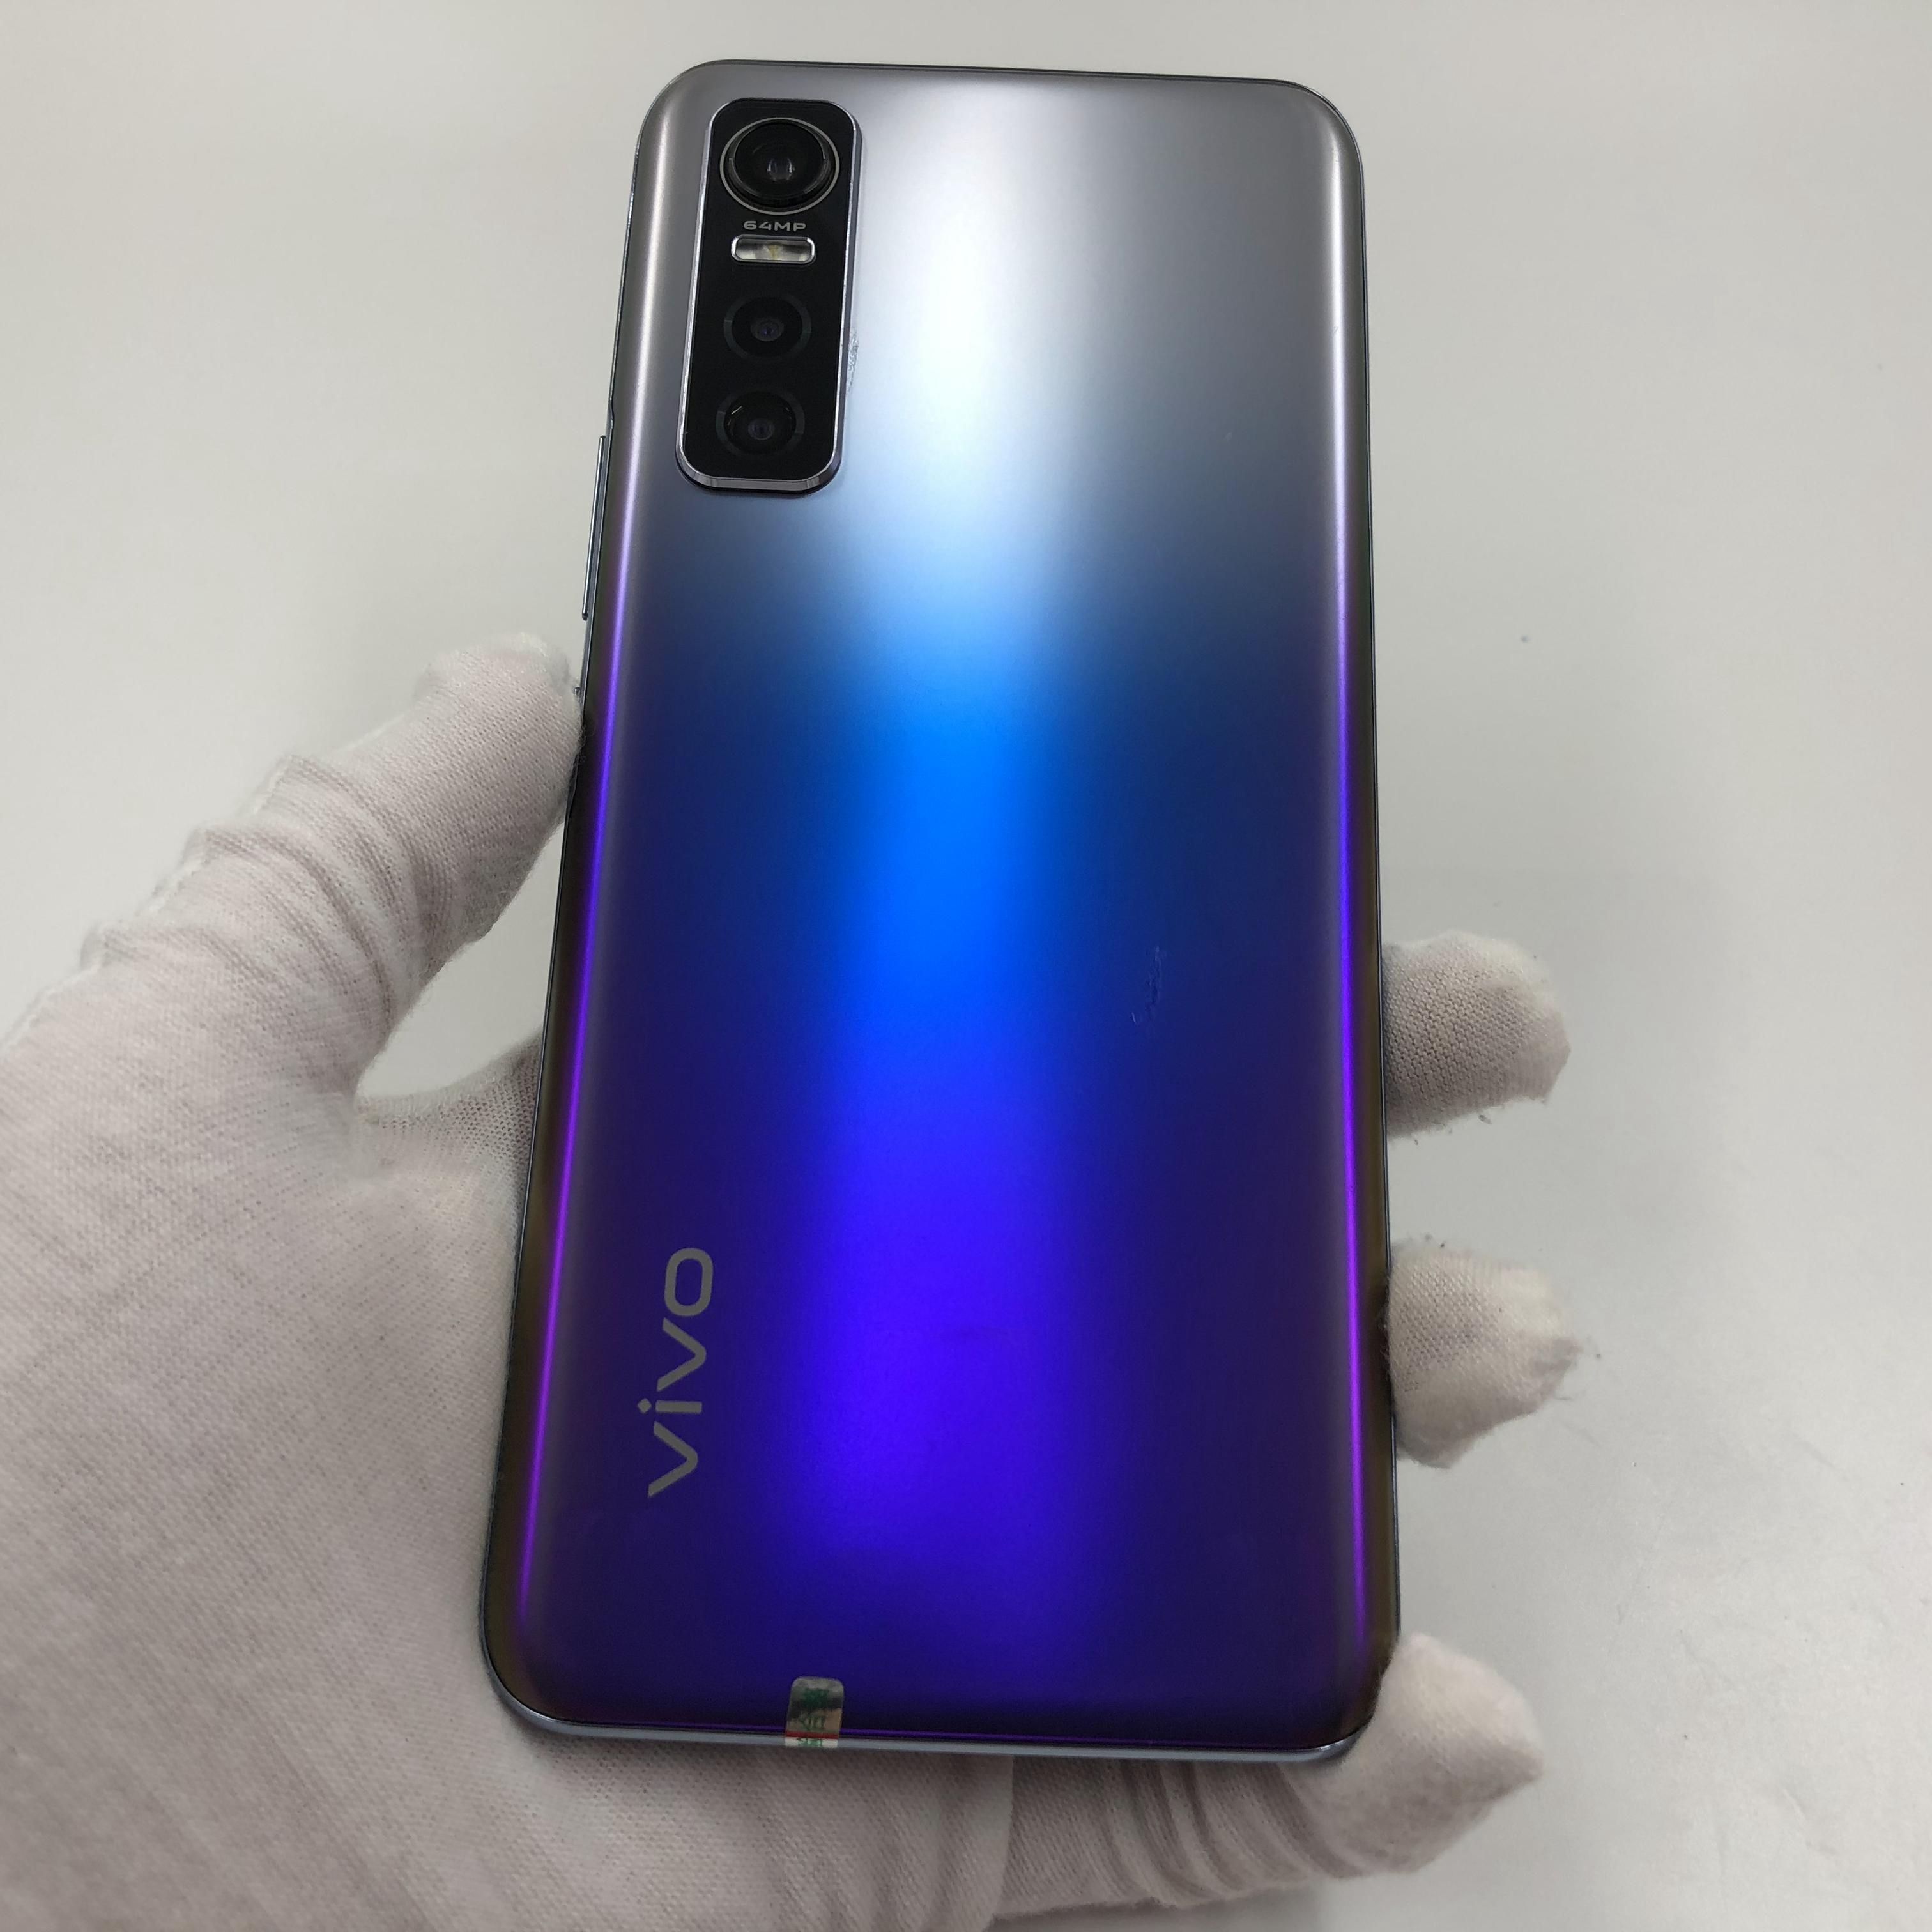 vivo【S7e 5G】5G全网通 幻砂星海 8G/128G 国行 9成新 原包装盒+配件